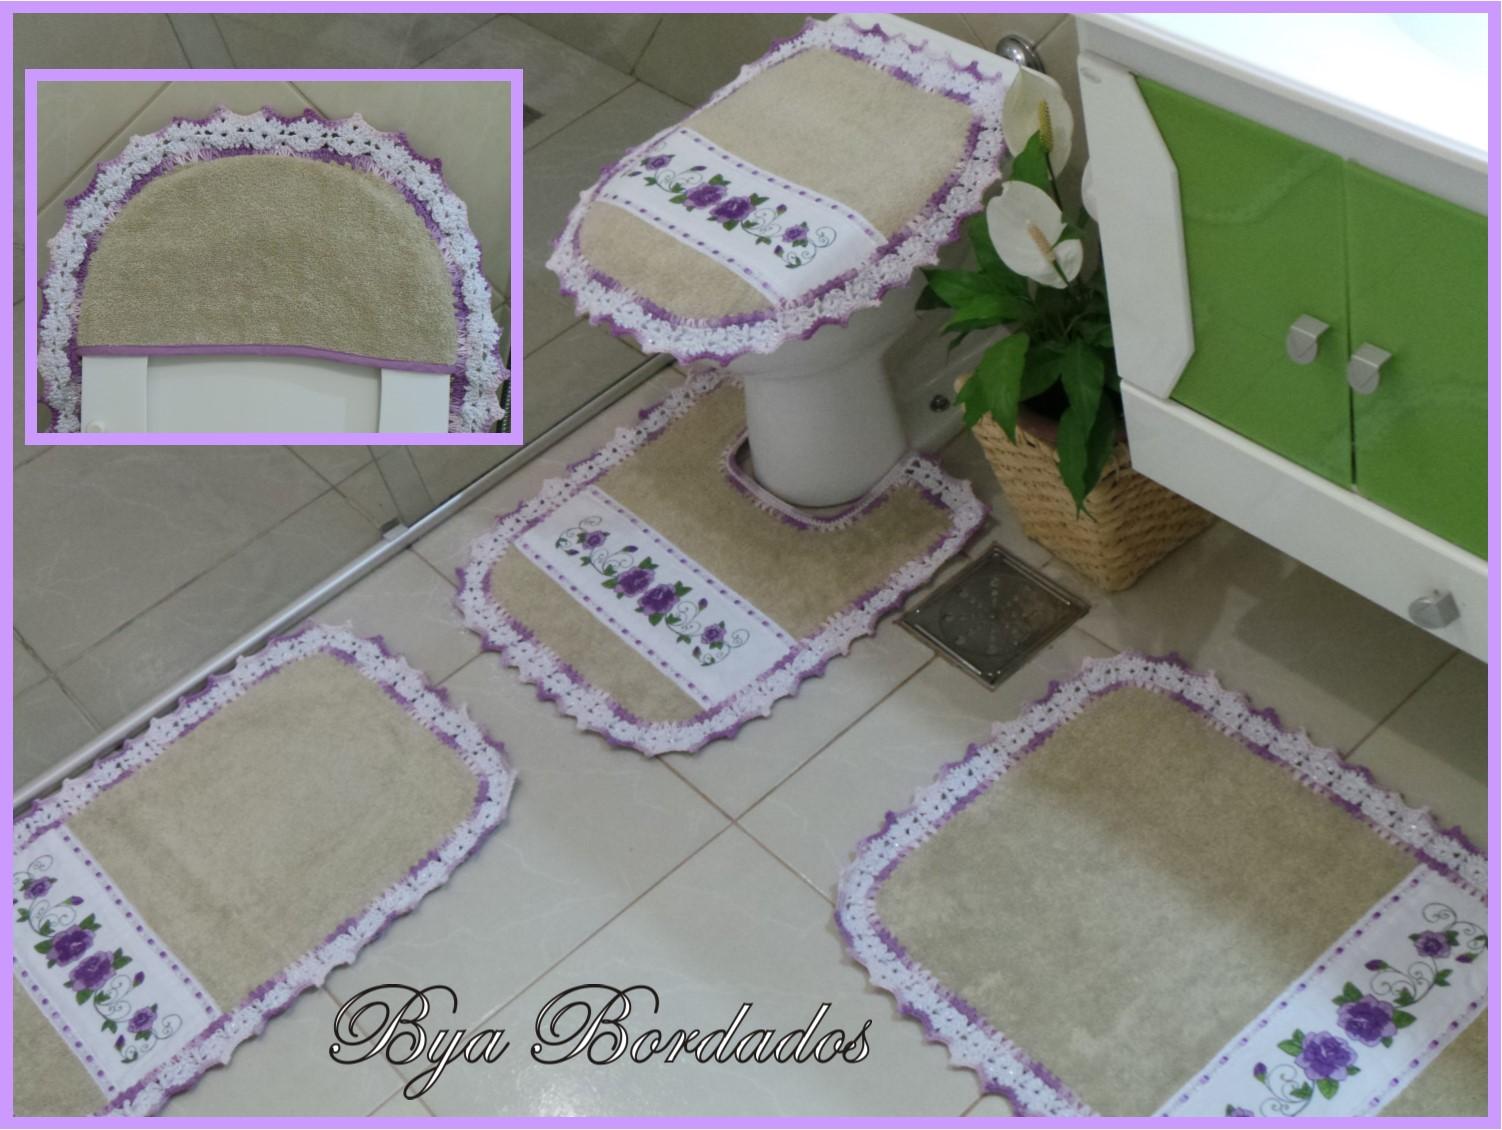 #6F12B9 jogo tapete banheiro atoalhado jogo banheiro atoalhado 1502x1130 px tapete para banheiro em l